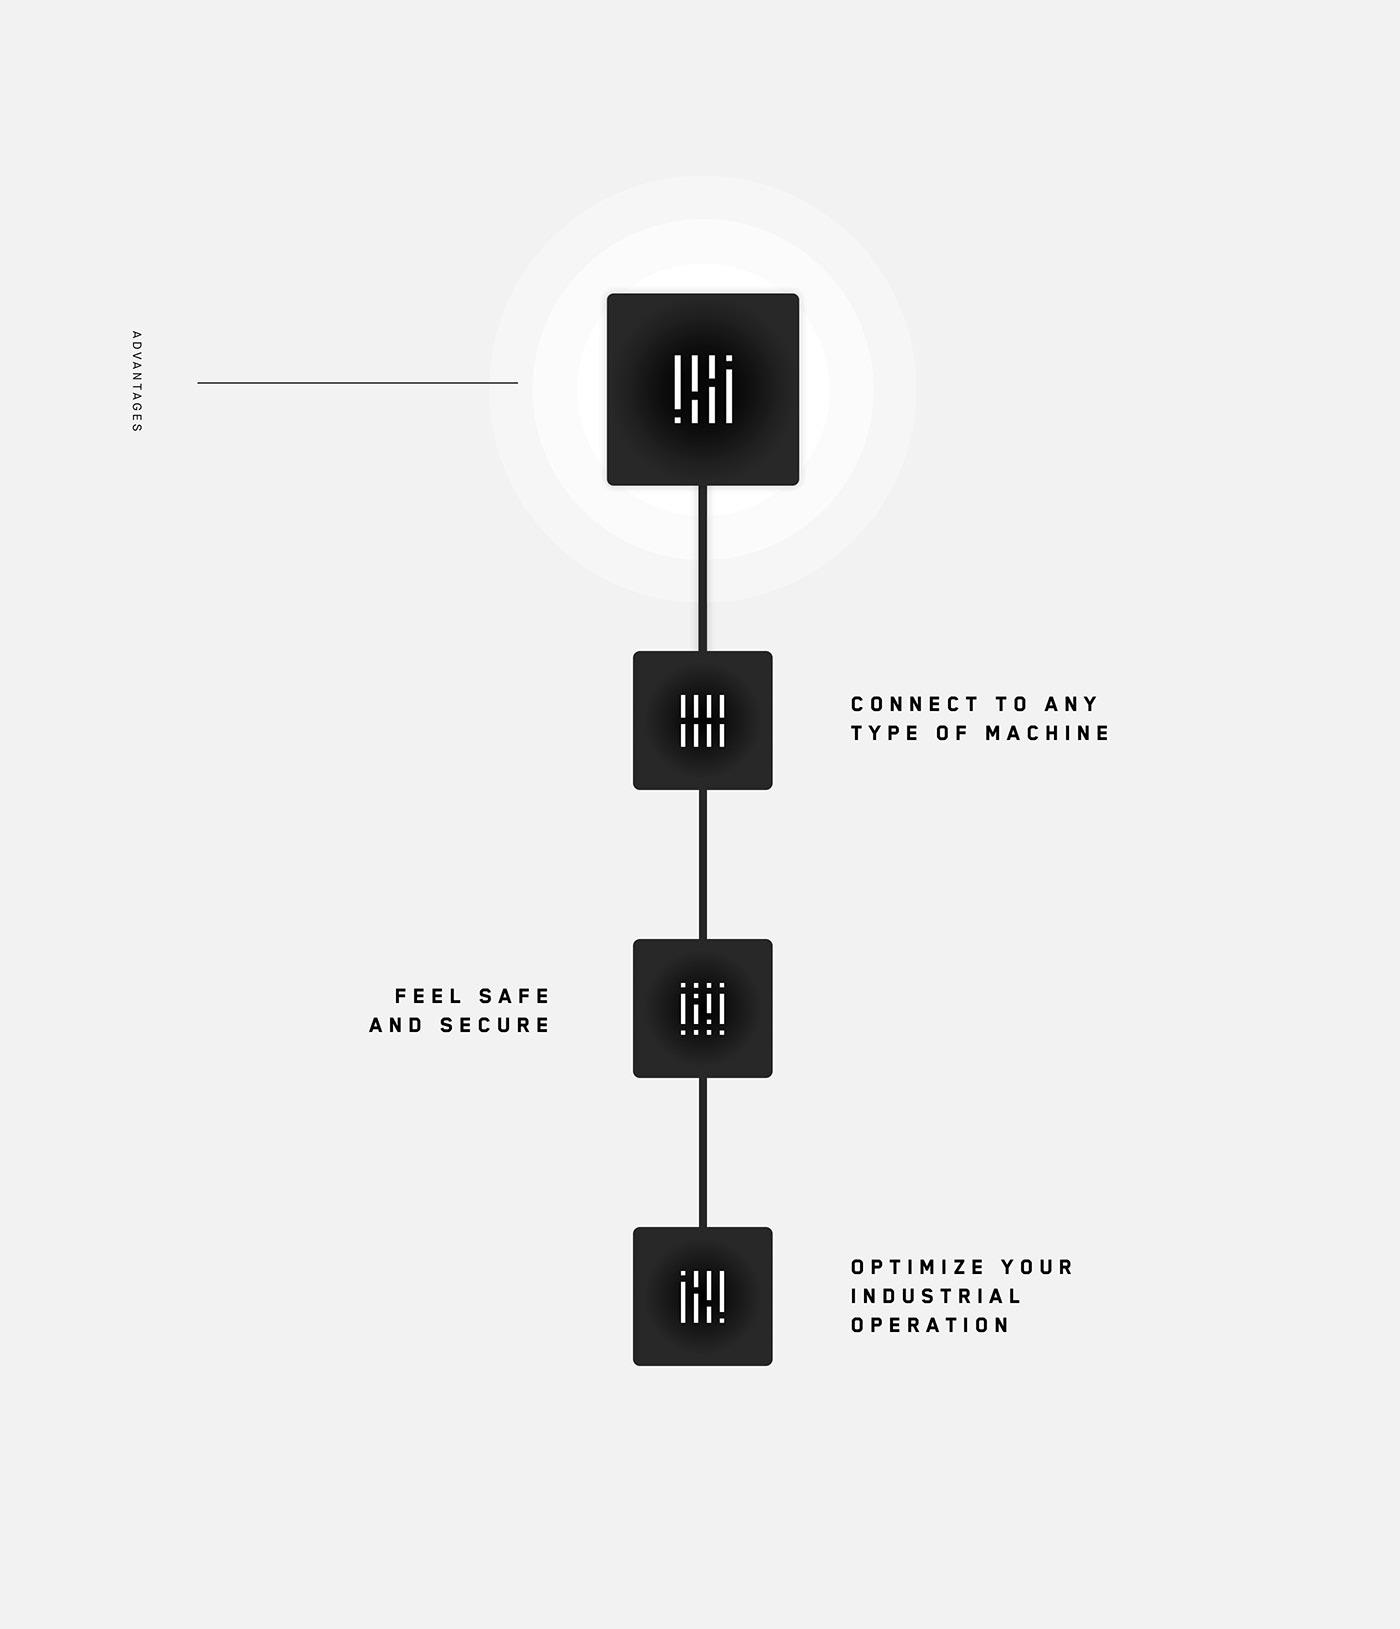 branding  ai artificial intelligence sensor Hub industry change evolution Startup Technology